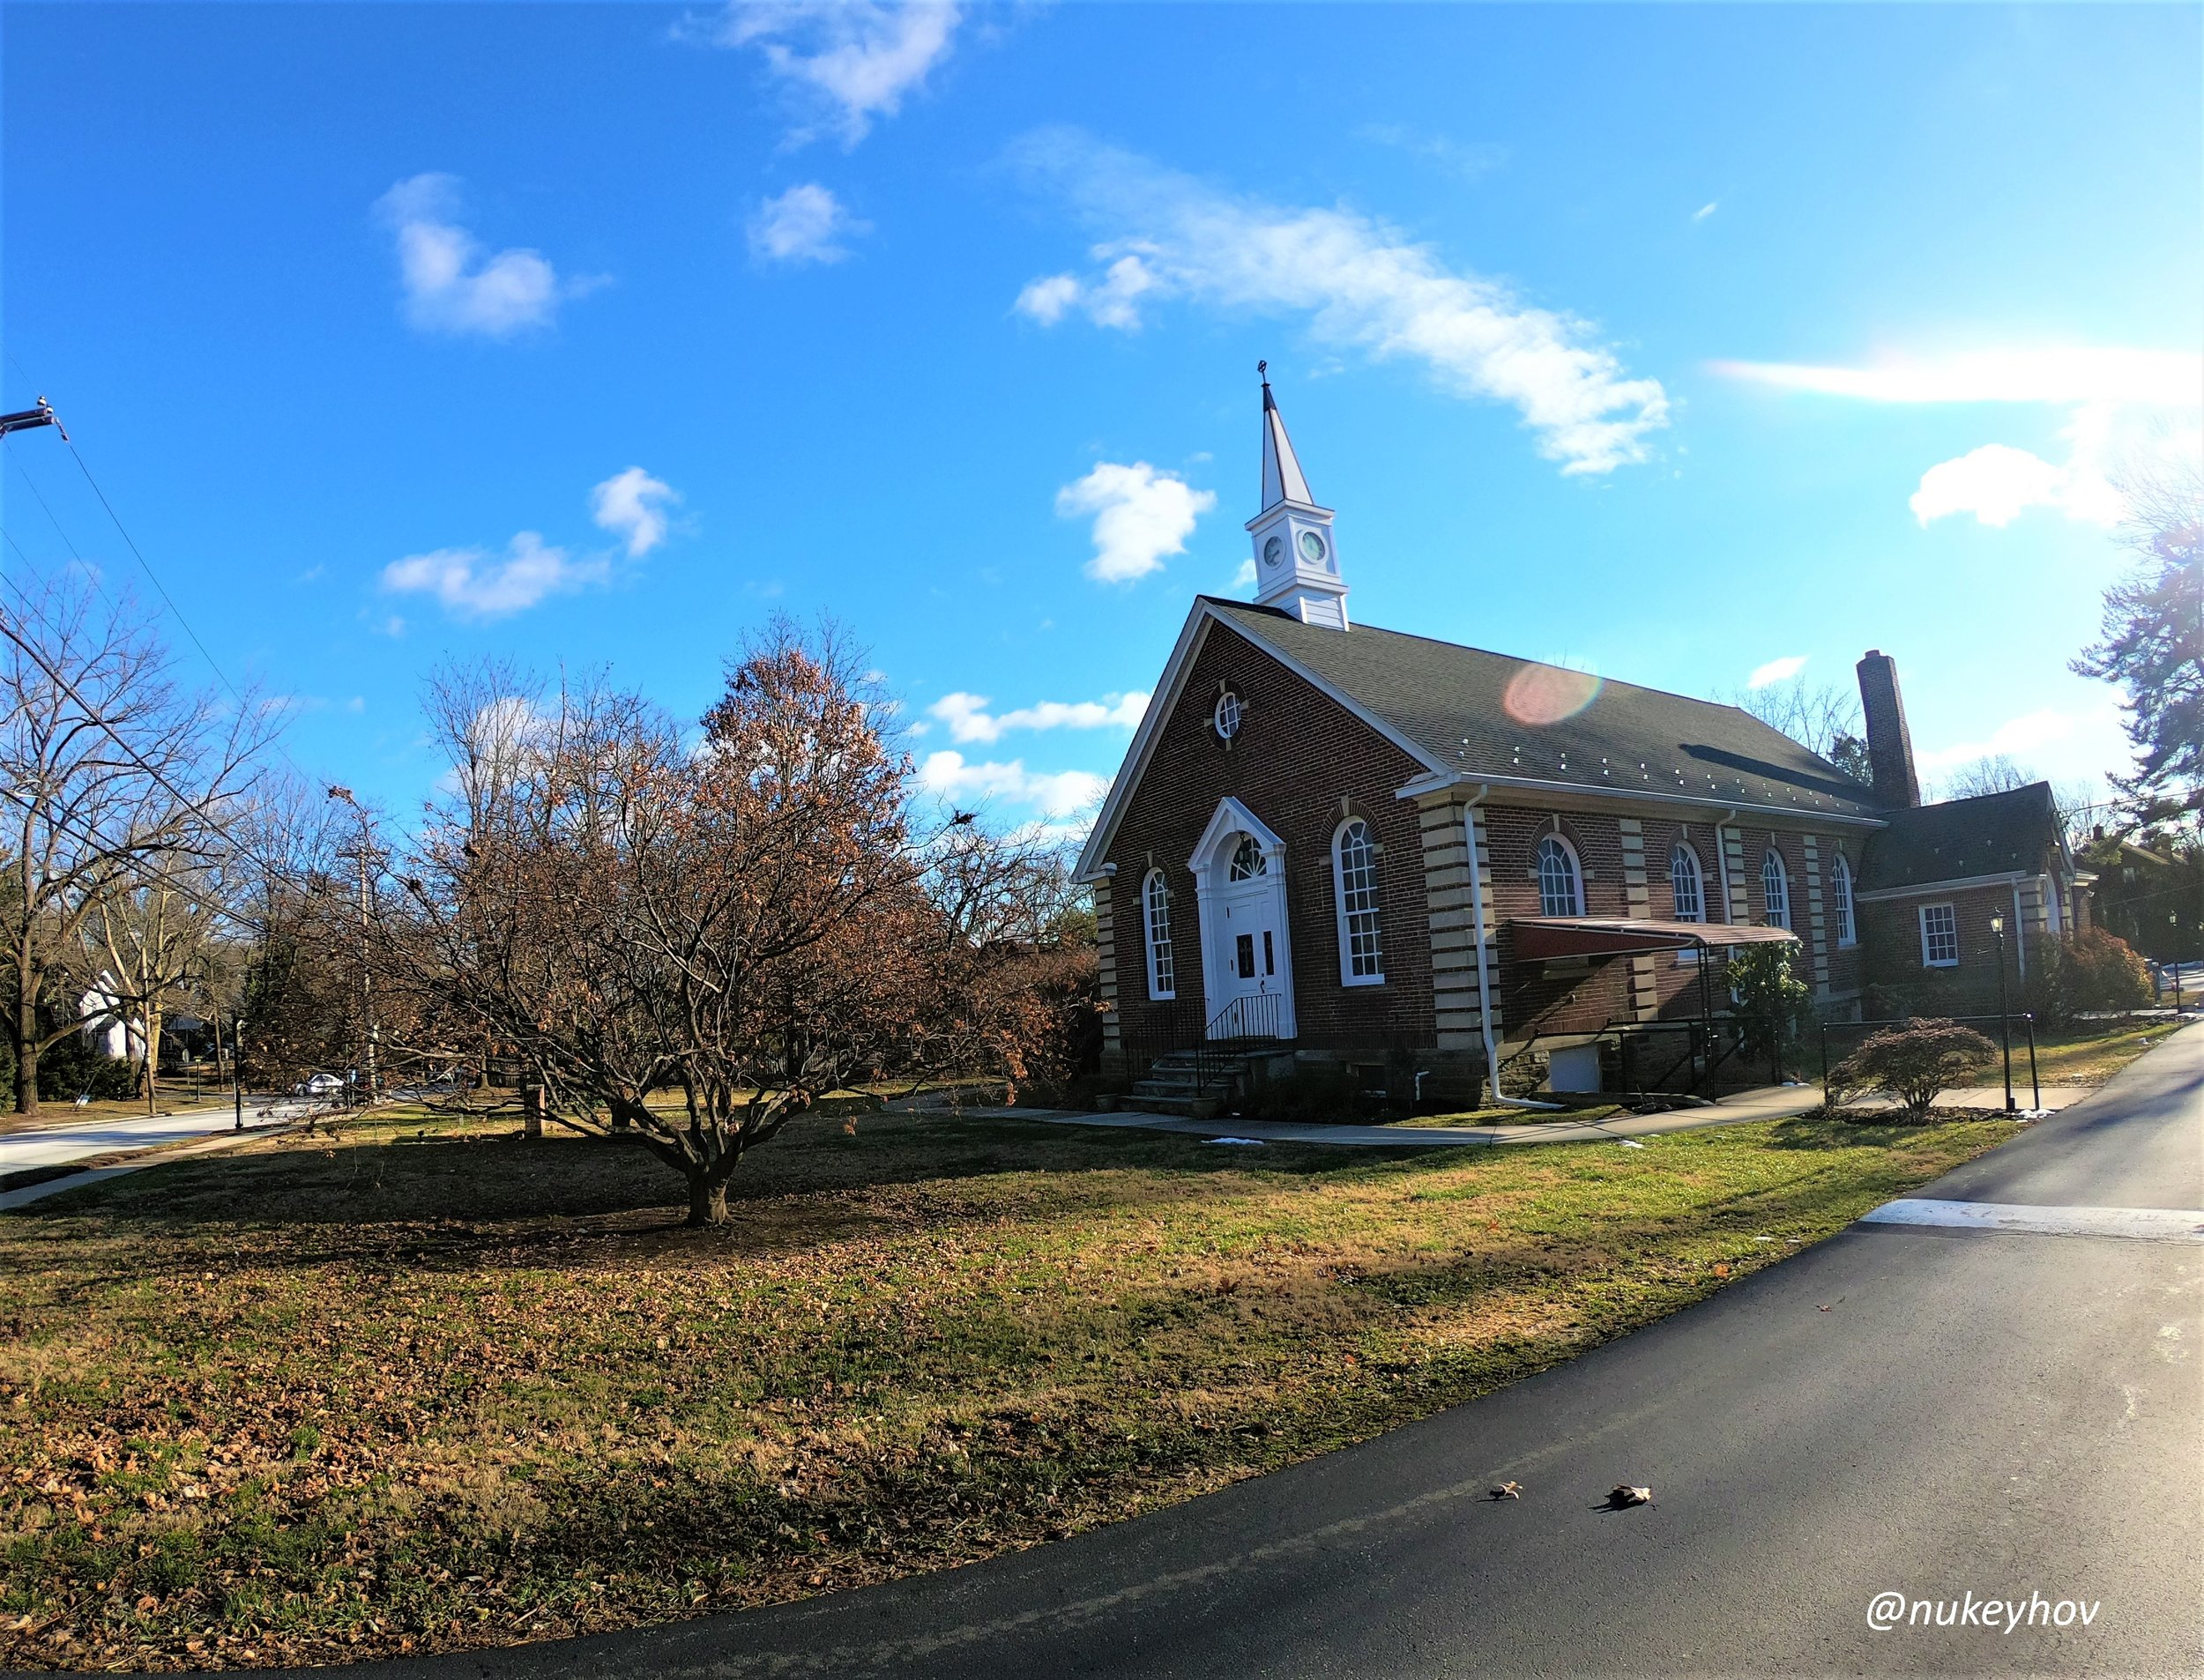 St. Mark's Armenian Catholic Church in Wynnewood, PA